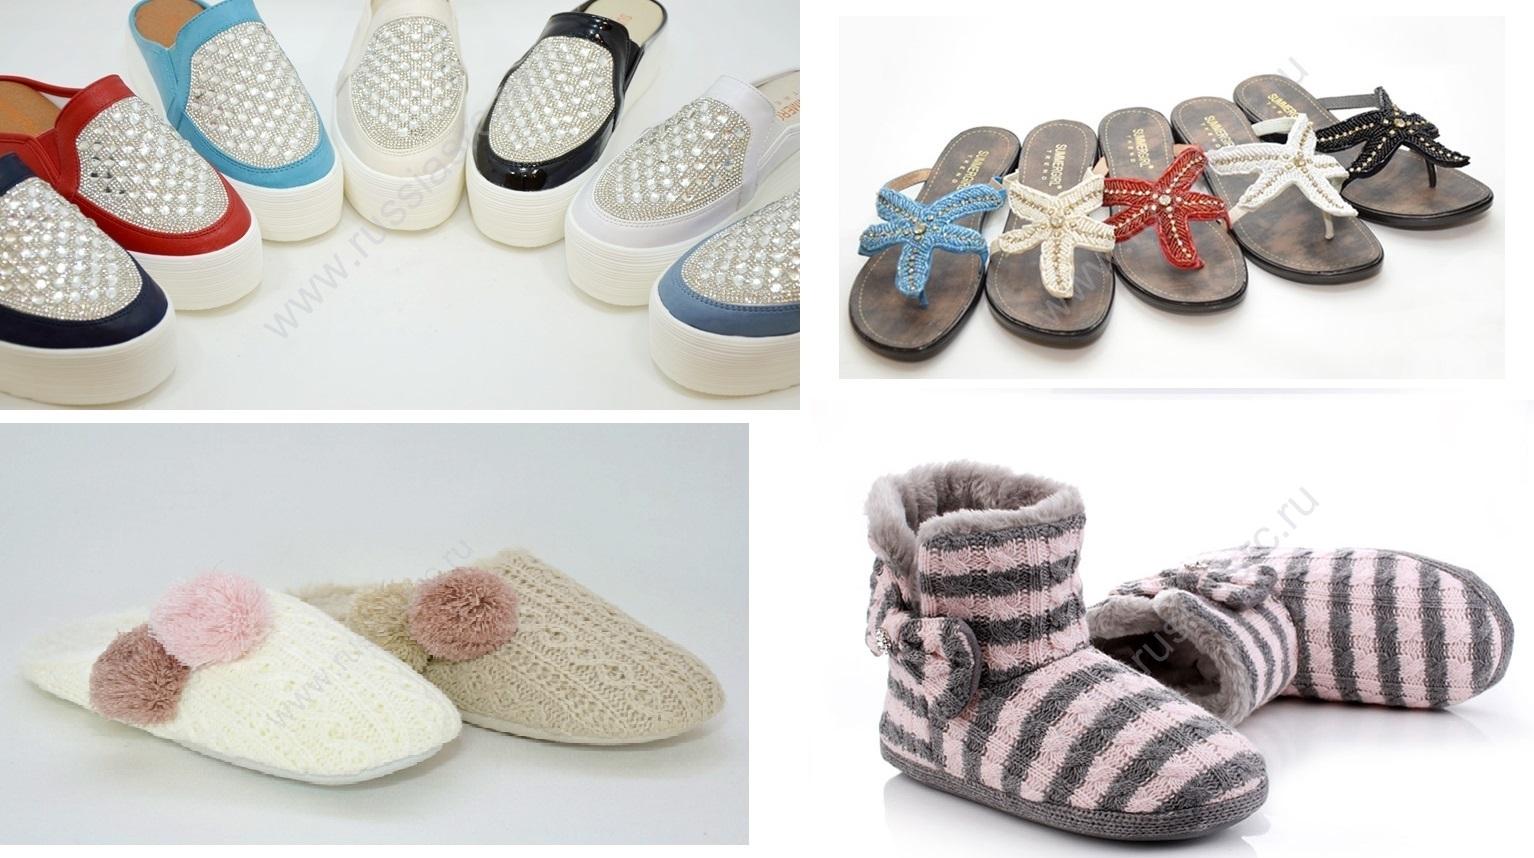 Сбор заказов.Slipper Republic-домашняя обувка,мокасинки,босоножки,сабо и сумочки по доступным ценам.Сбор 2.